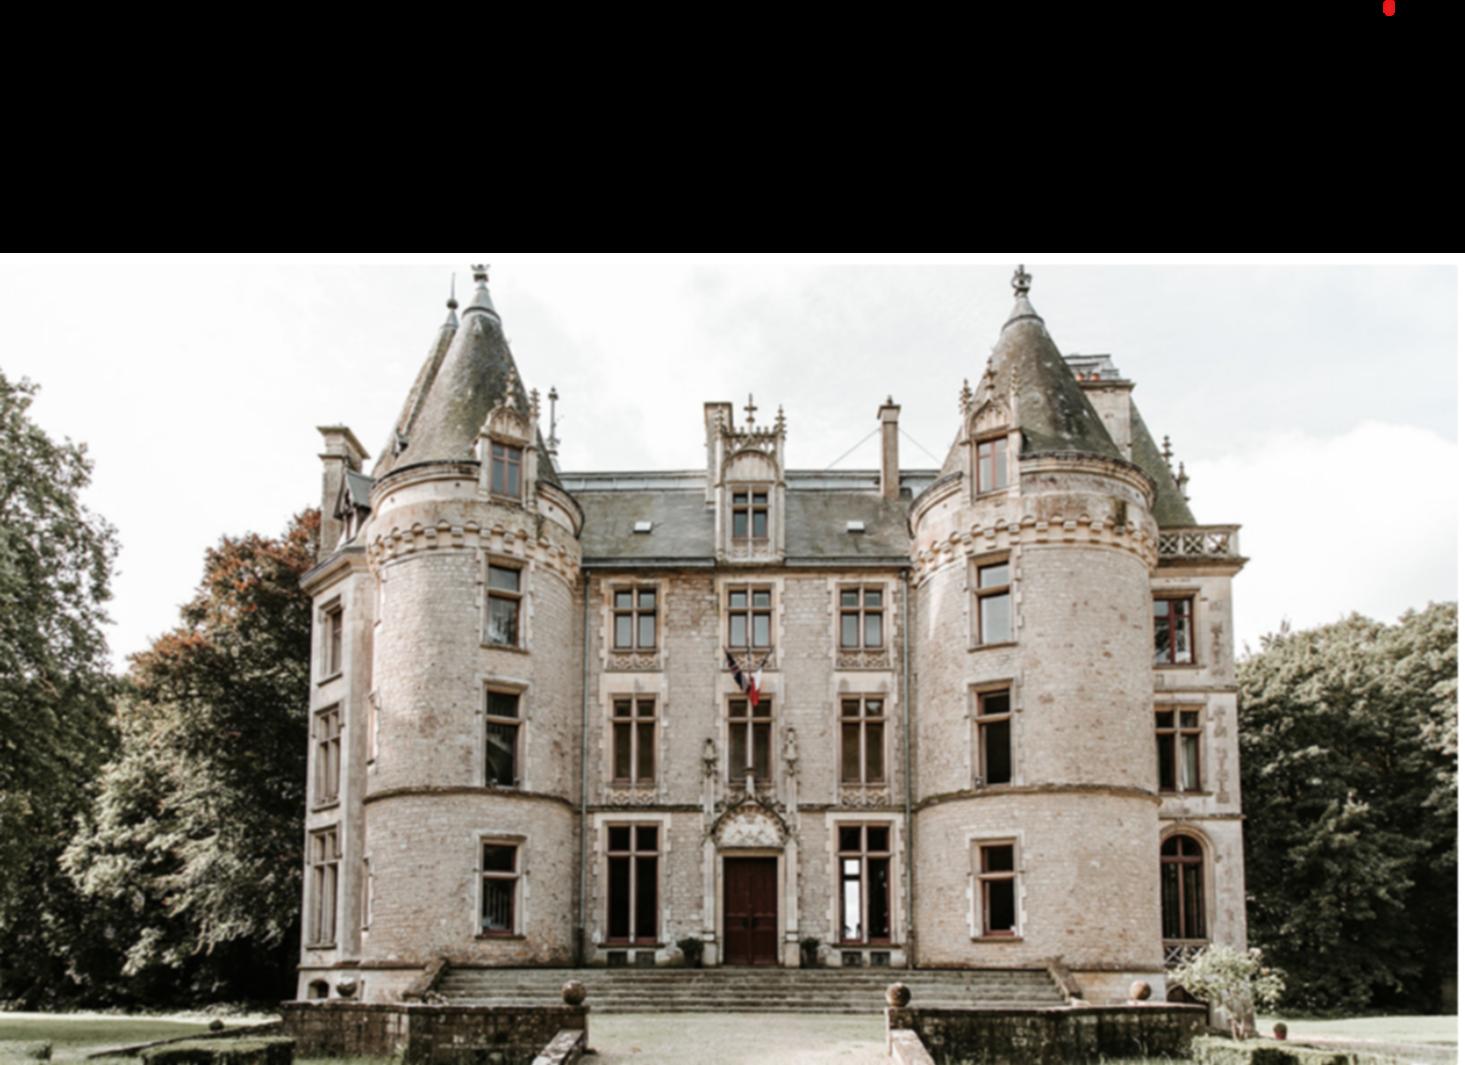 A castle on top of a building at Château de l'Isle Marie.